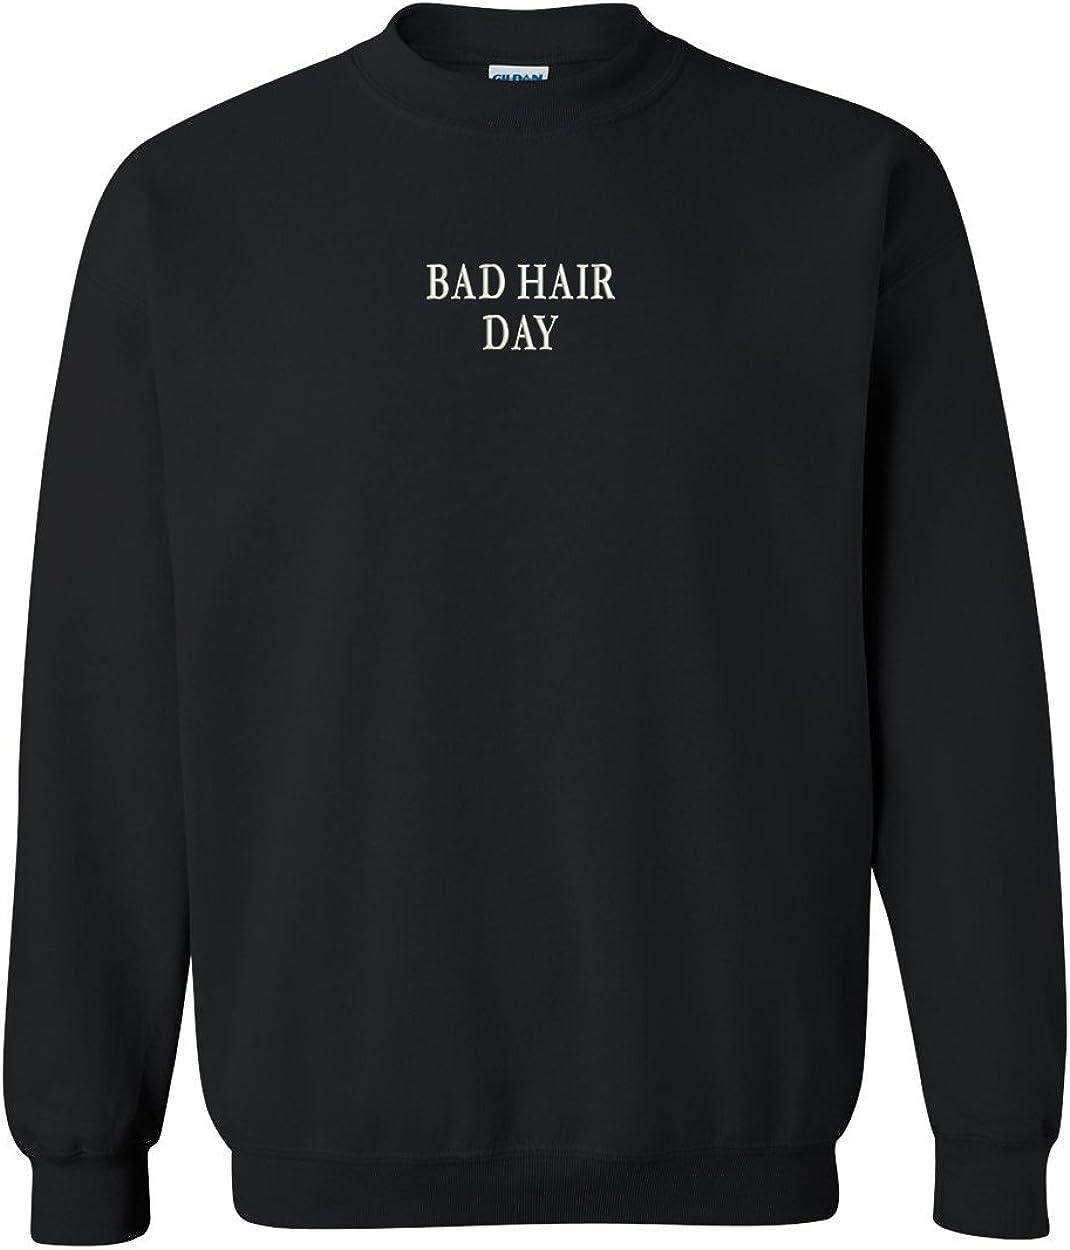 Trendy Apparel Shop Bad Hair Day Embroidered Crewneck Sweatshirt